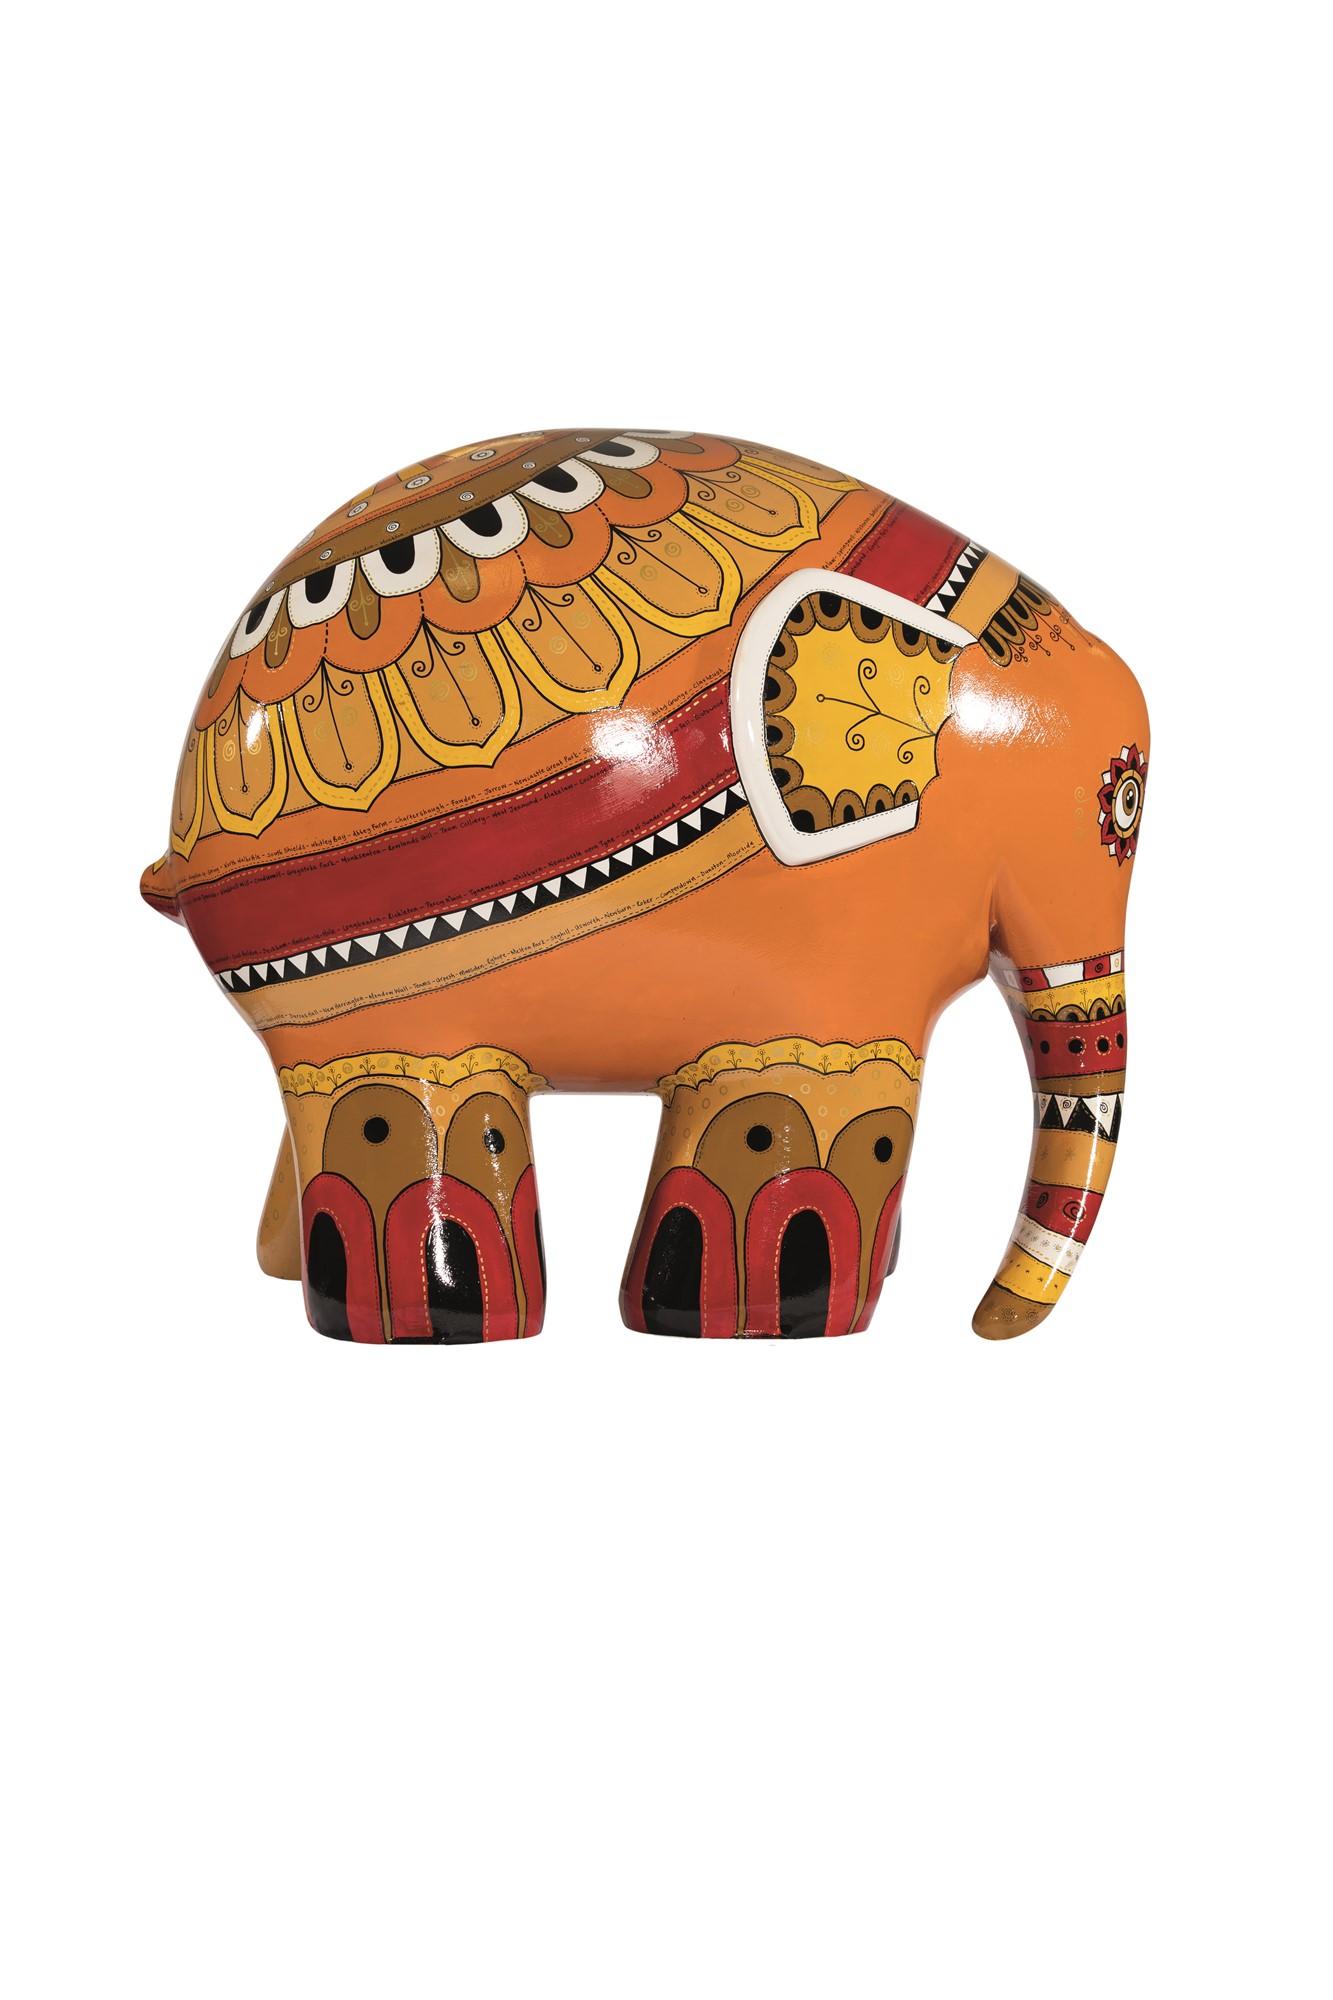 Lot 45 - Henna the Elephant